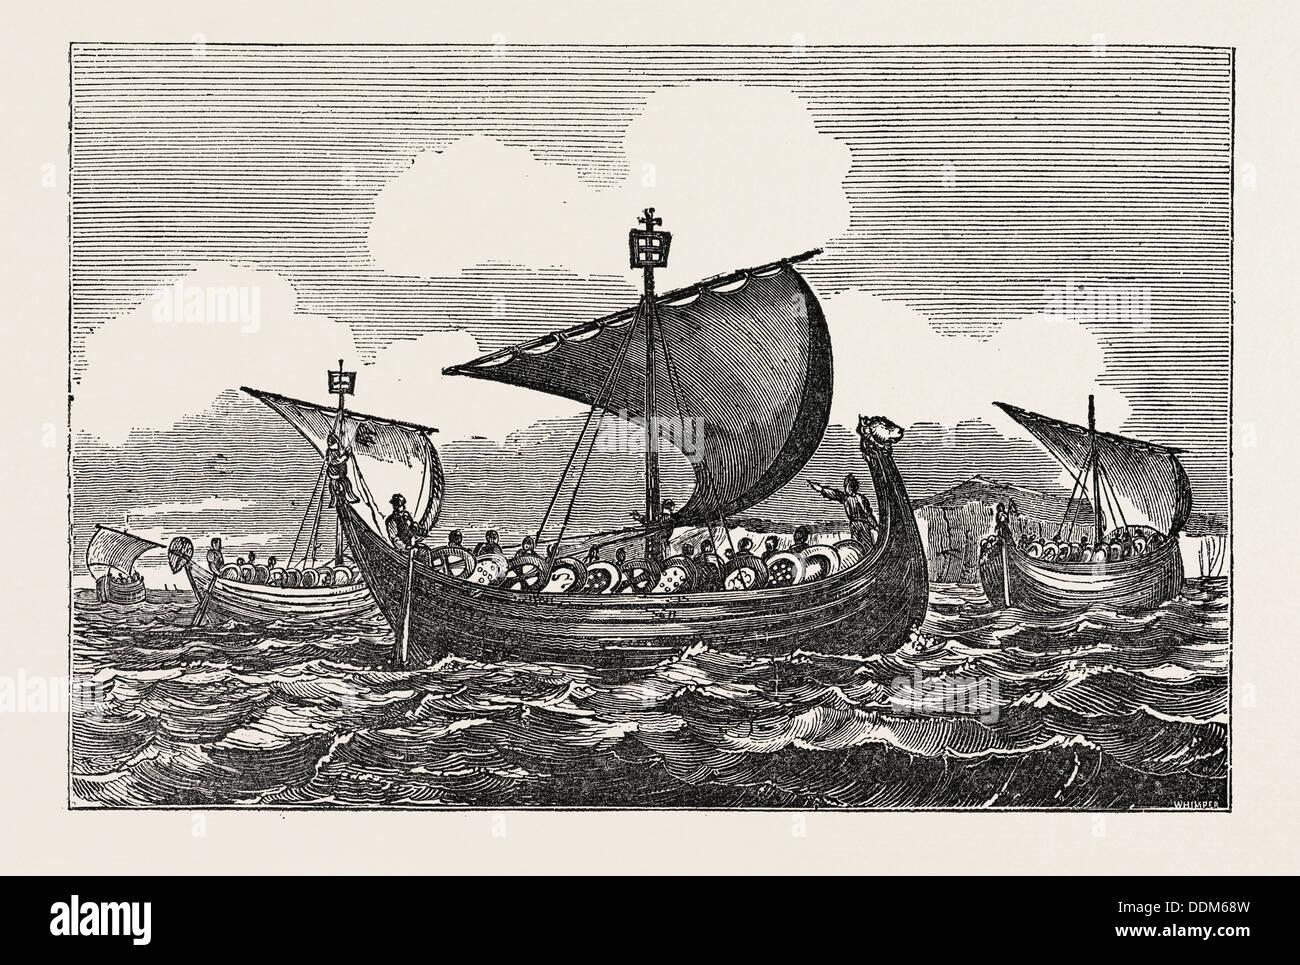 SHIPS OF WILLIAM THE CONQUEROR 1066 Stock Photo